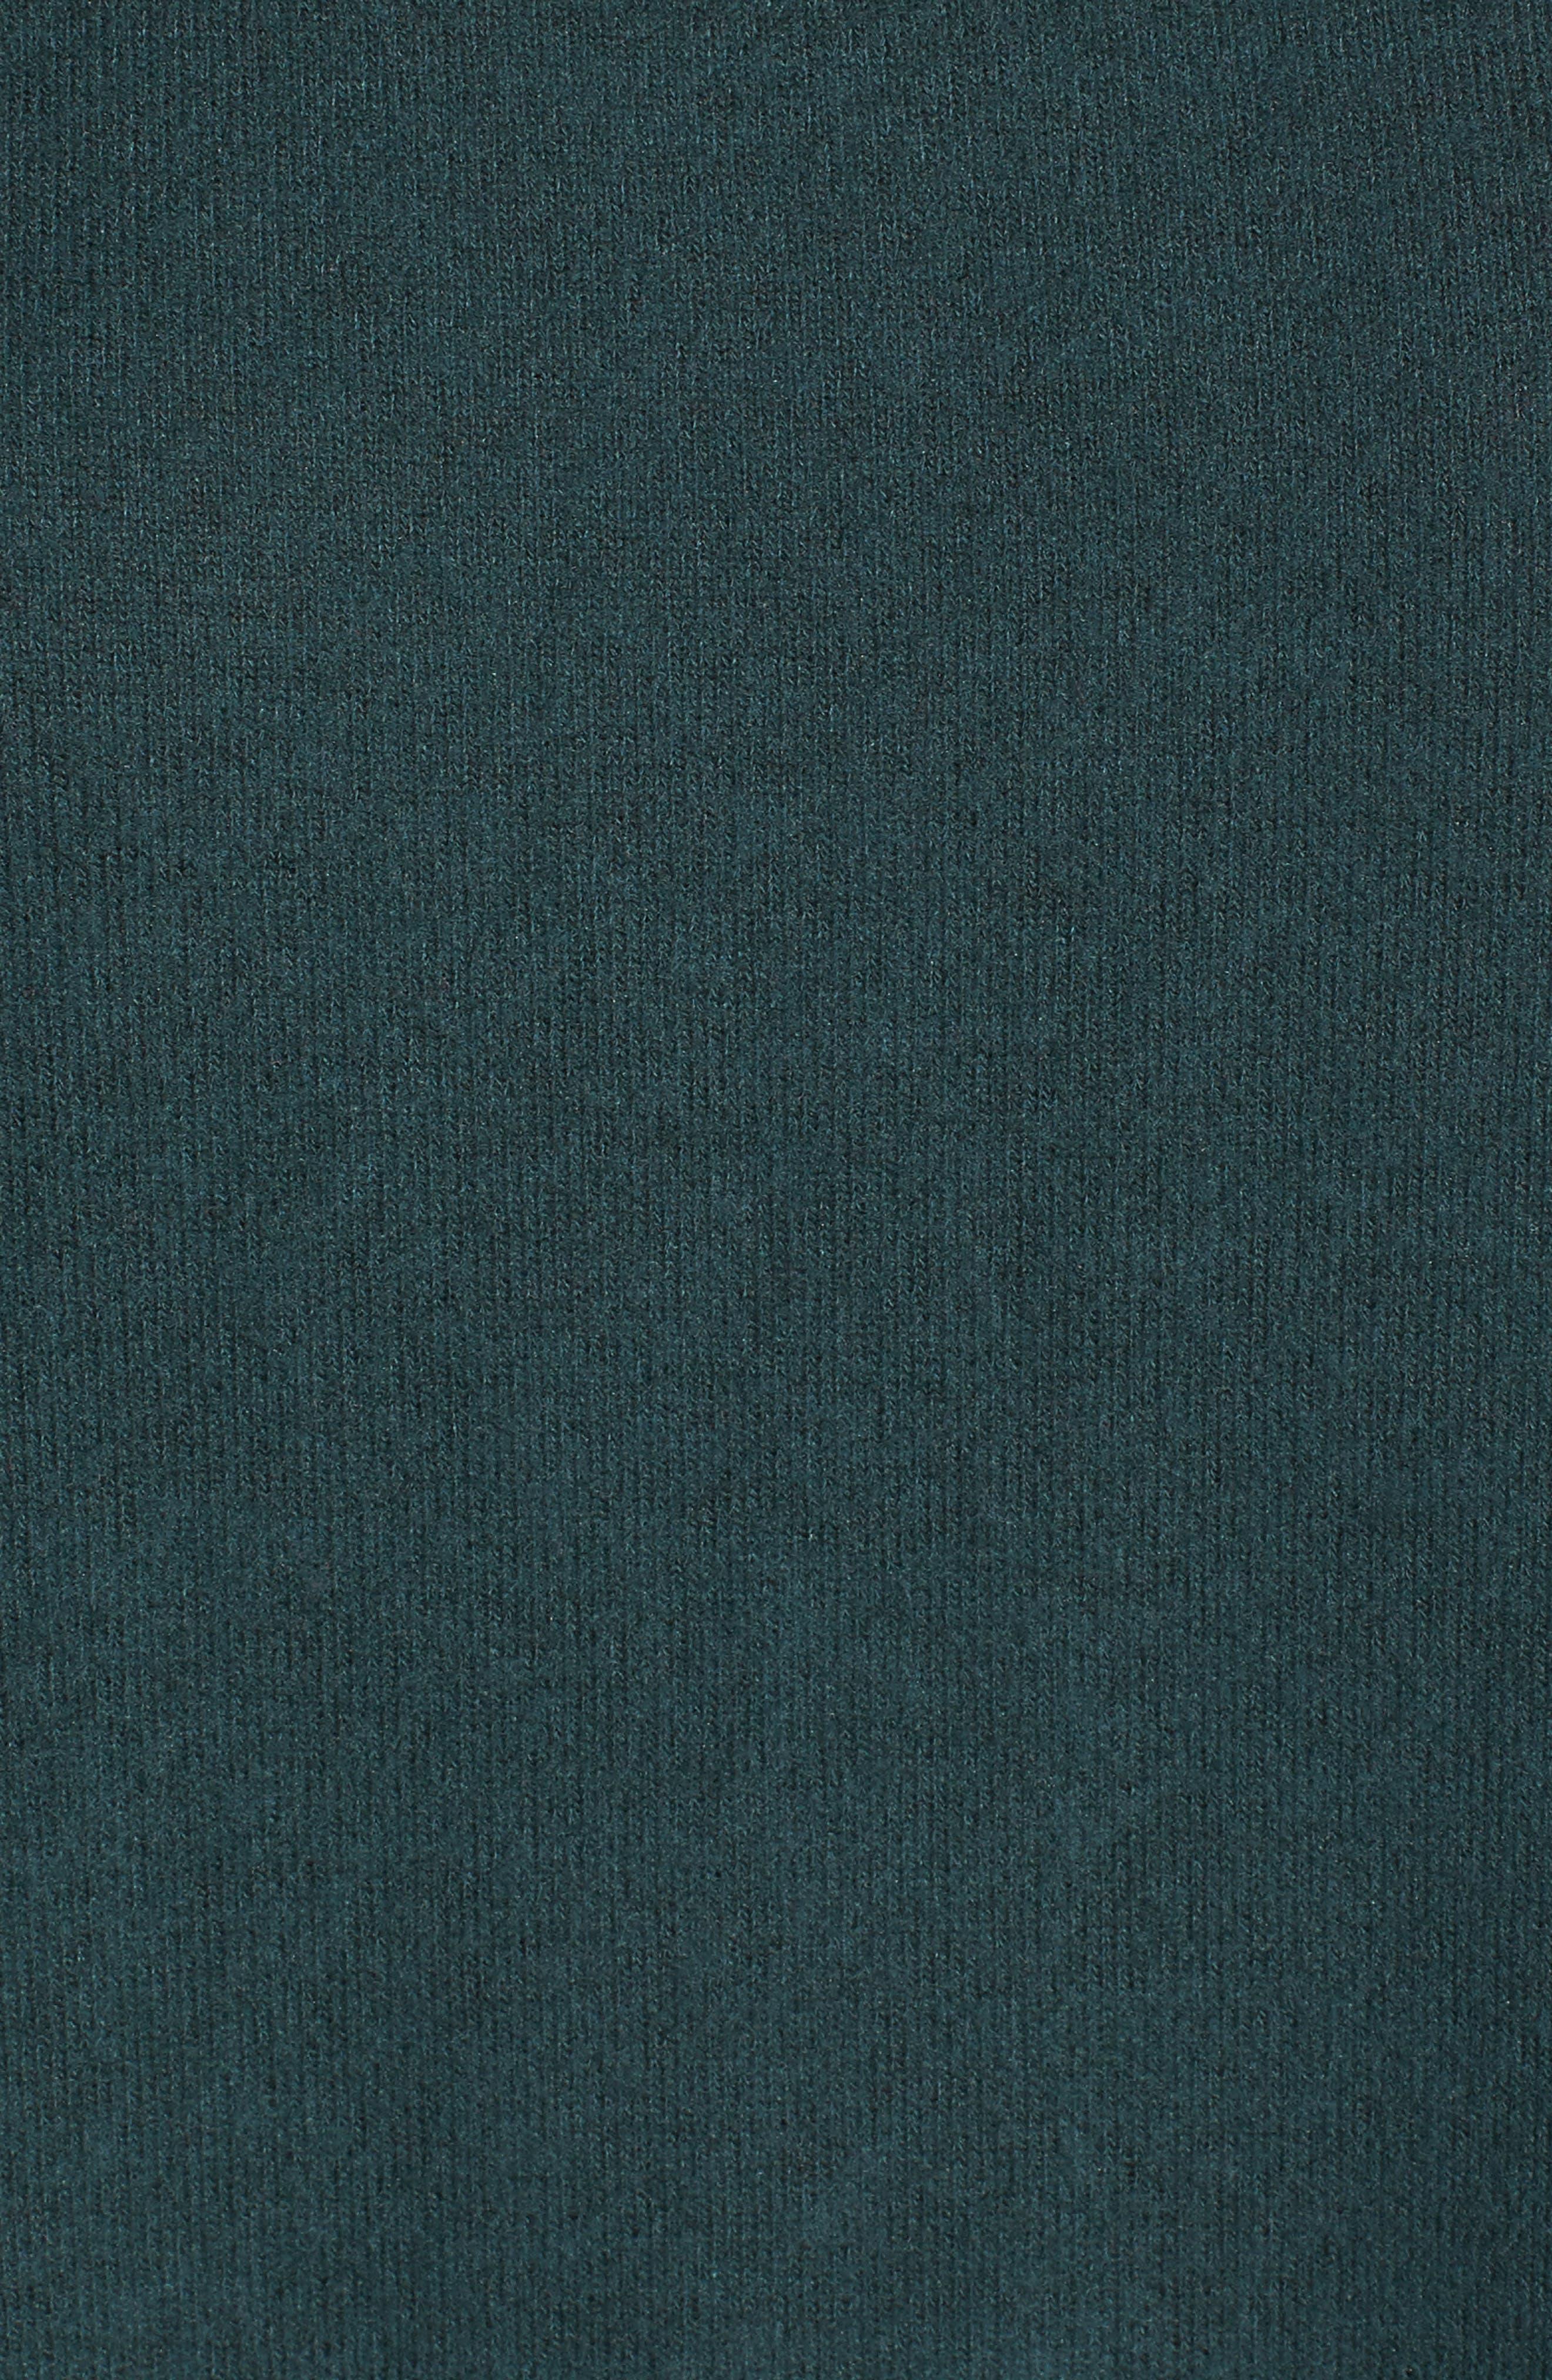 Cozy Ballet Neck High/Low Pullover,                             Alternate thumbnail 5, color,                             Green Gables